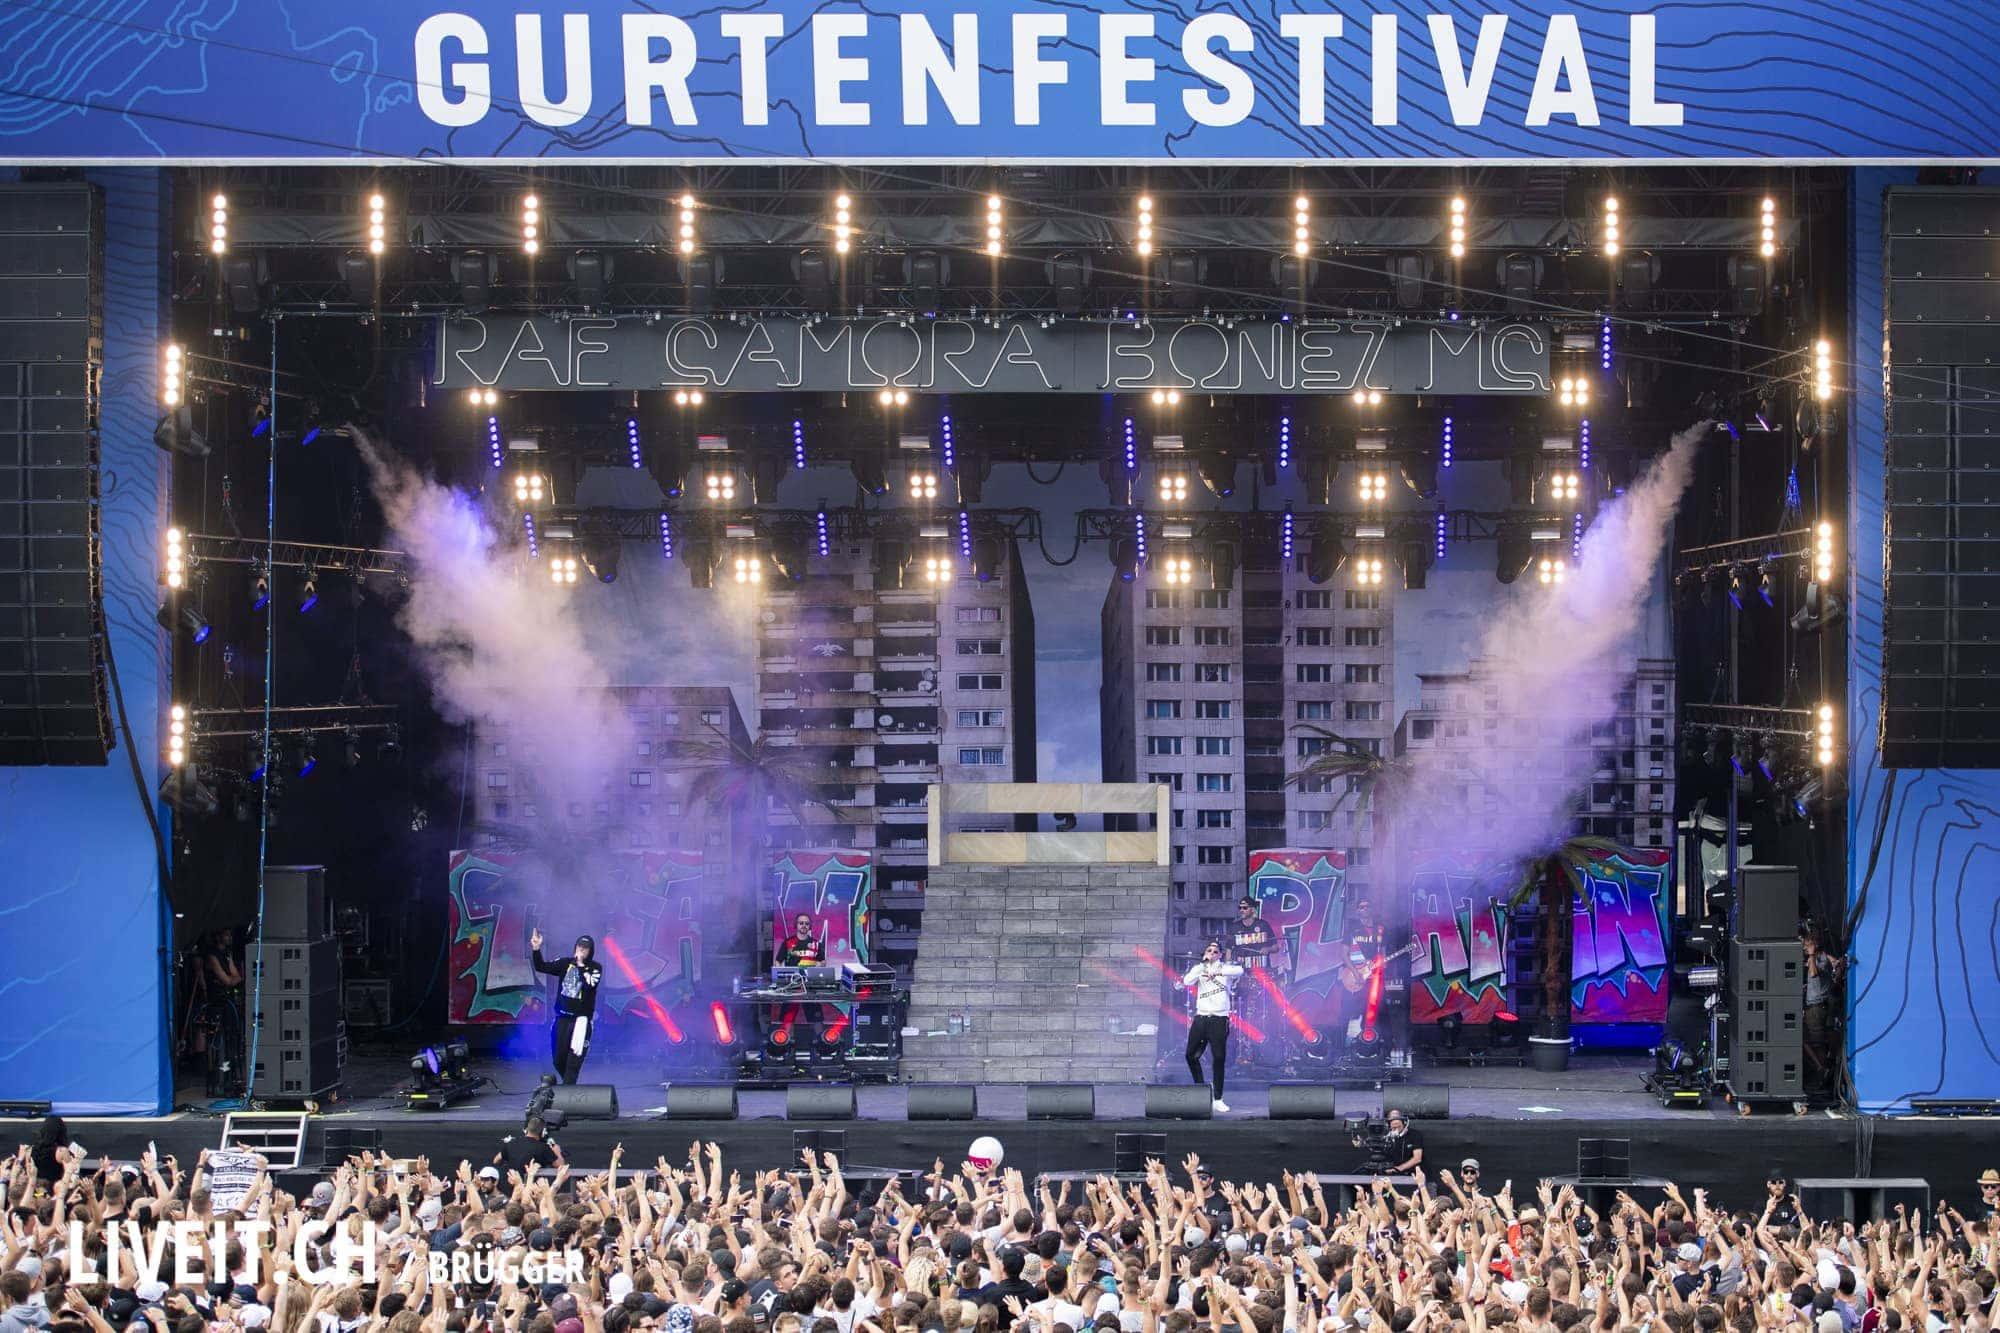 Bonez MC & RAF Camora Gurtenfestival 2018 in Bern. (Dominic Bruegger for Gurtenfestival)